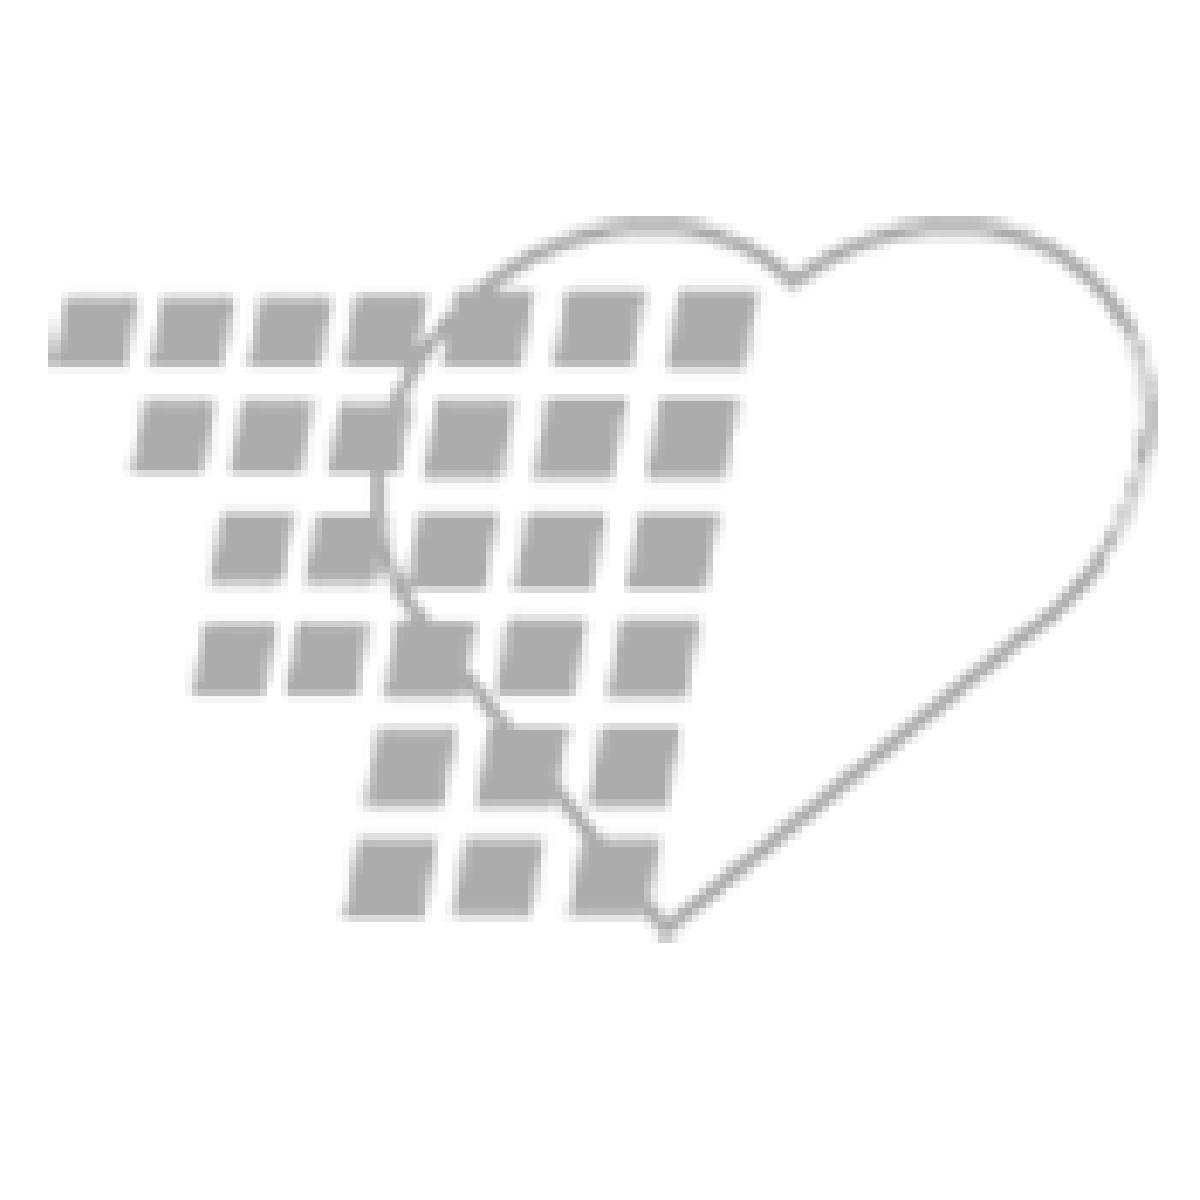 02-43-3617-REFURB M Series 3 Lead ECG Defibrillator with AED